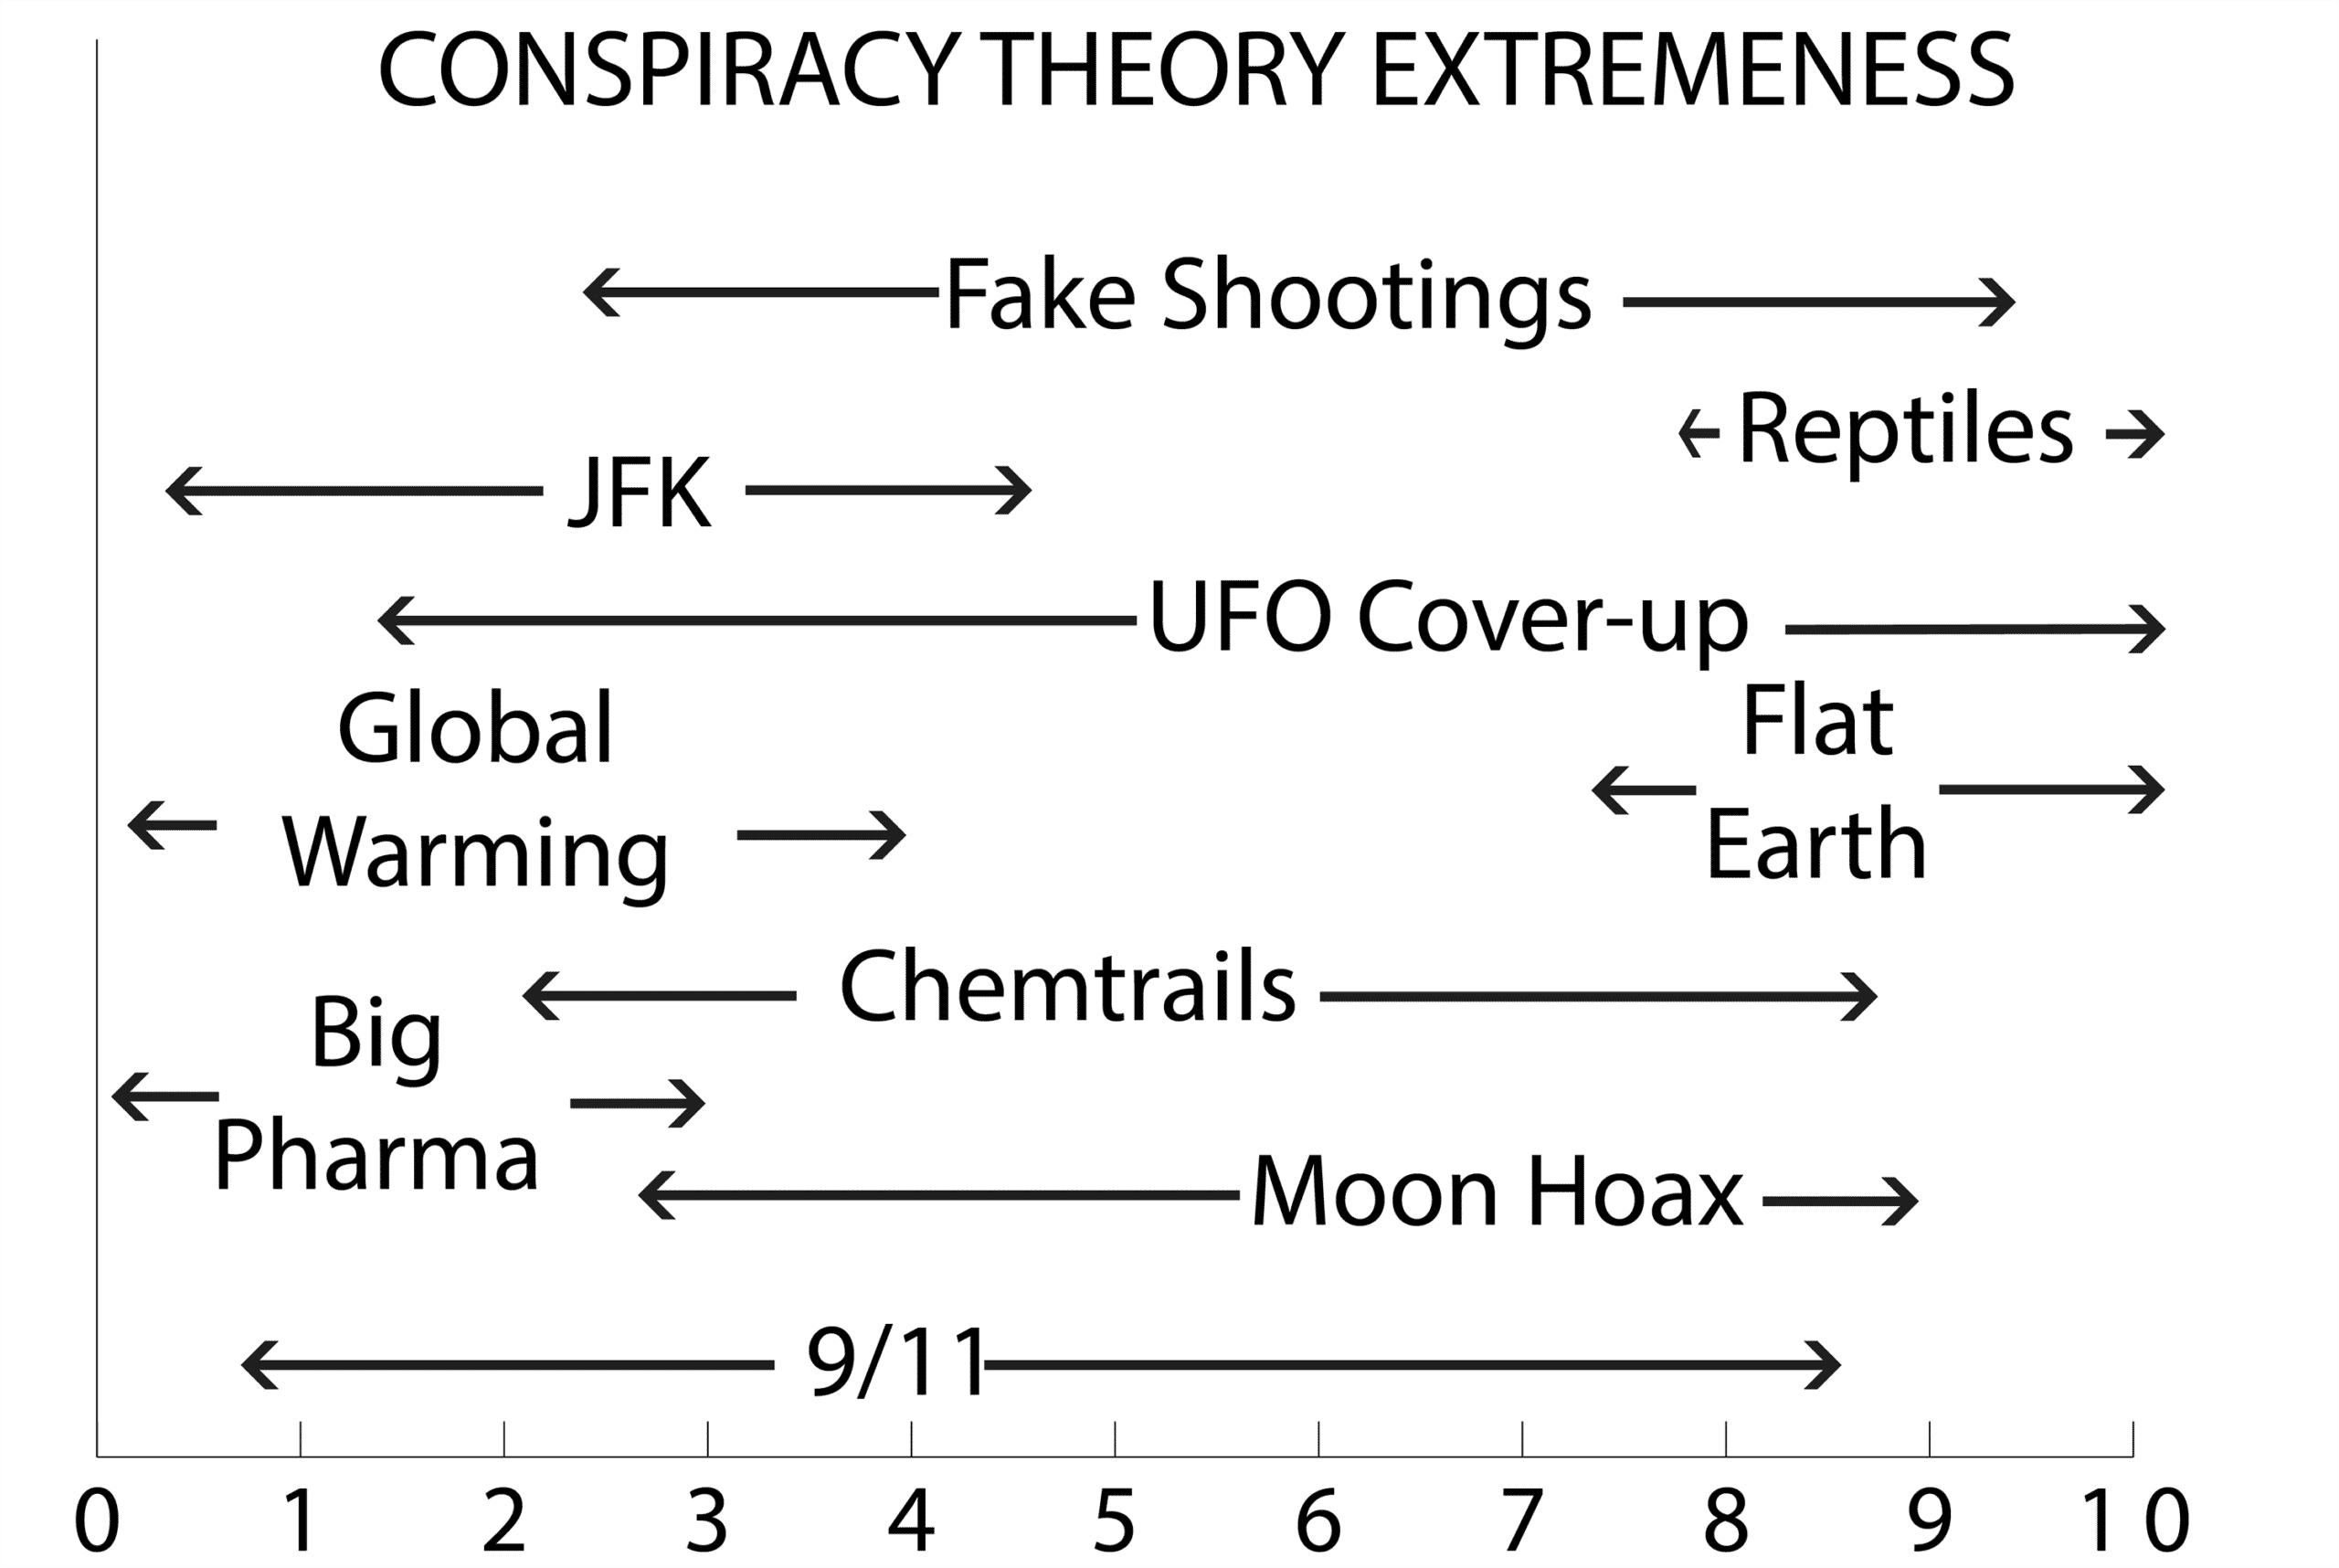 conspiracy theory extremeness